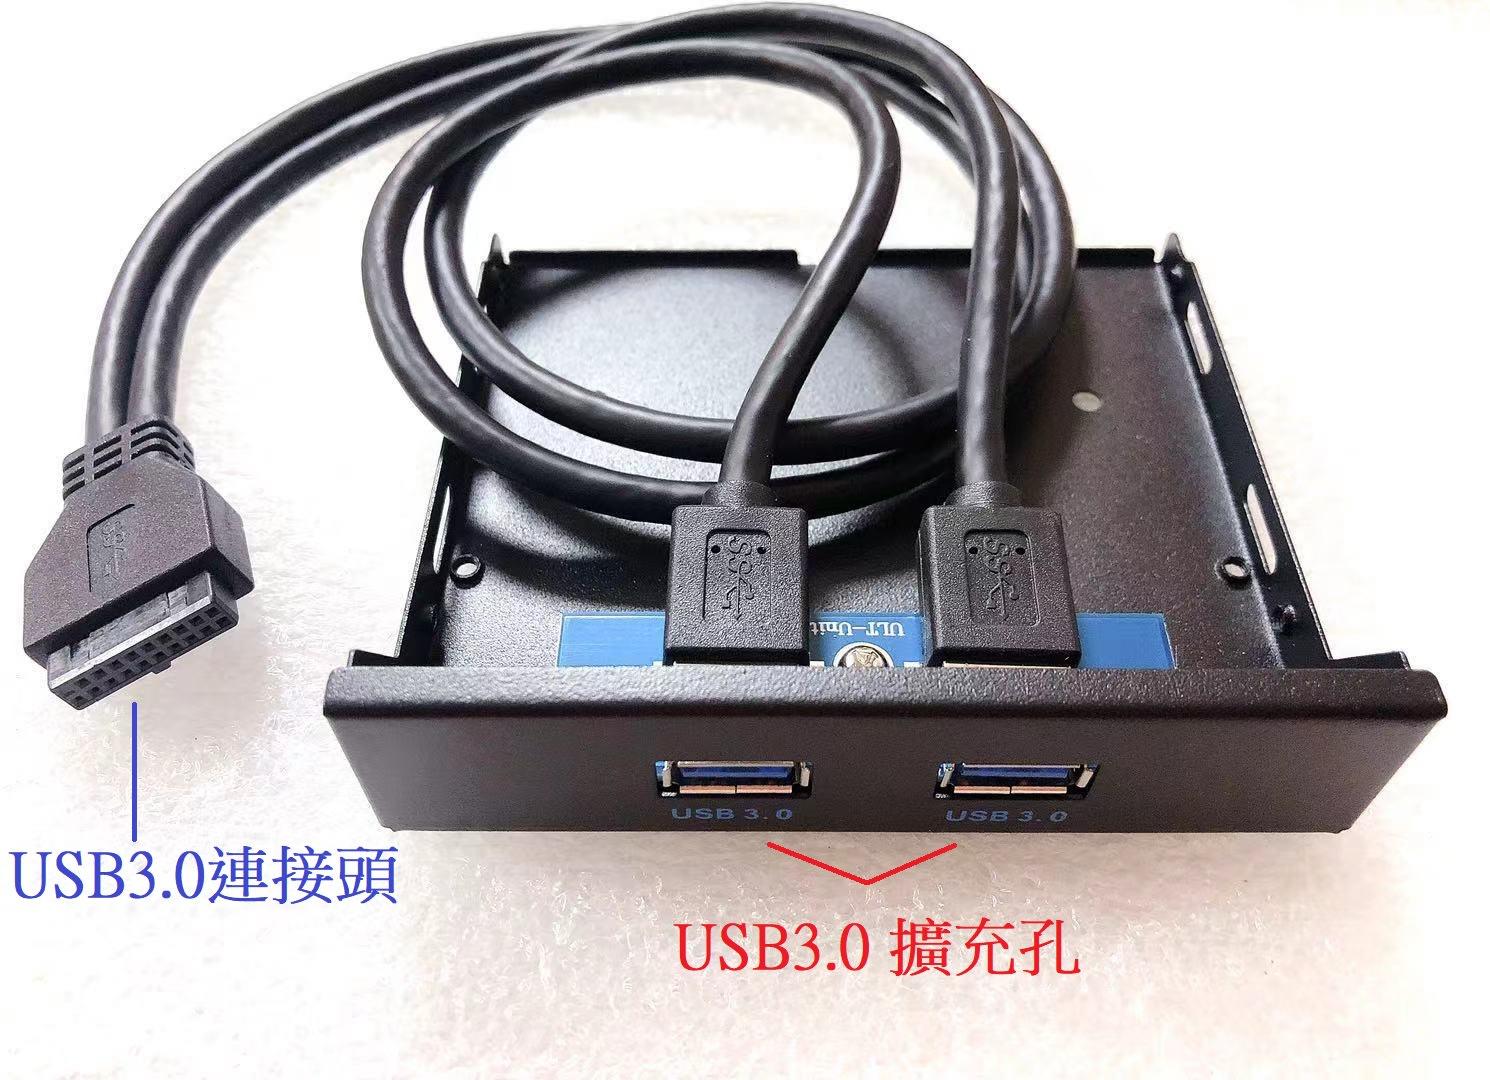 U3-045 機箱3.5前置面板 USB3.0機殼面板 USB3.0*2擴充面板 USB一分二 USB3.0分接座